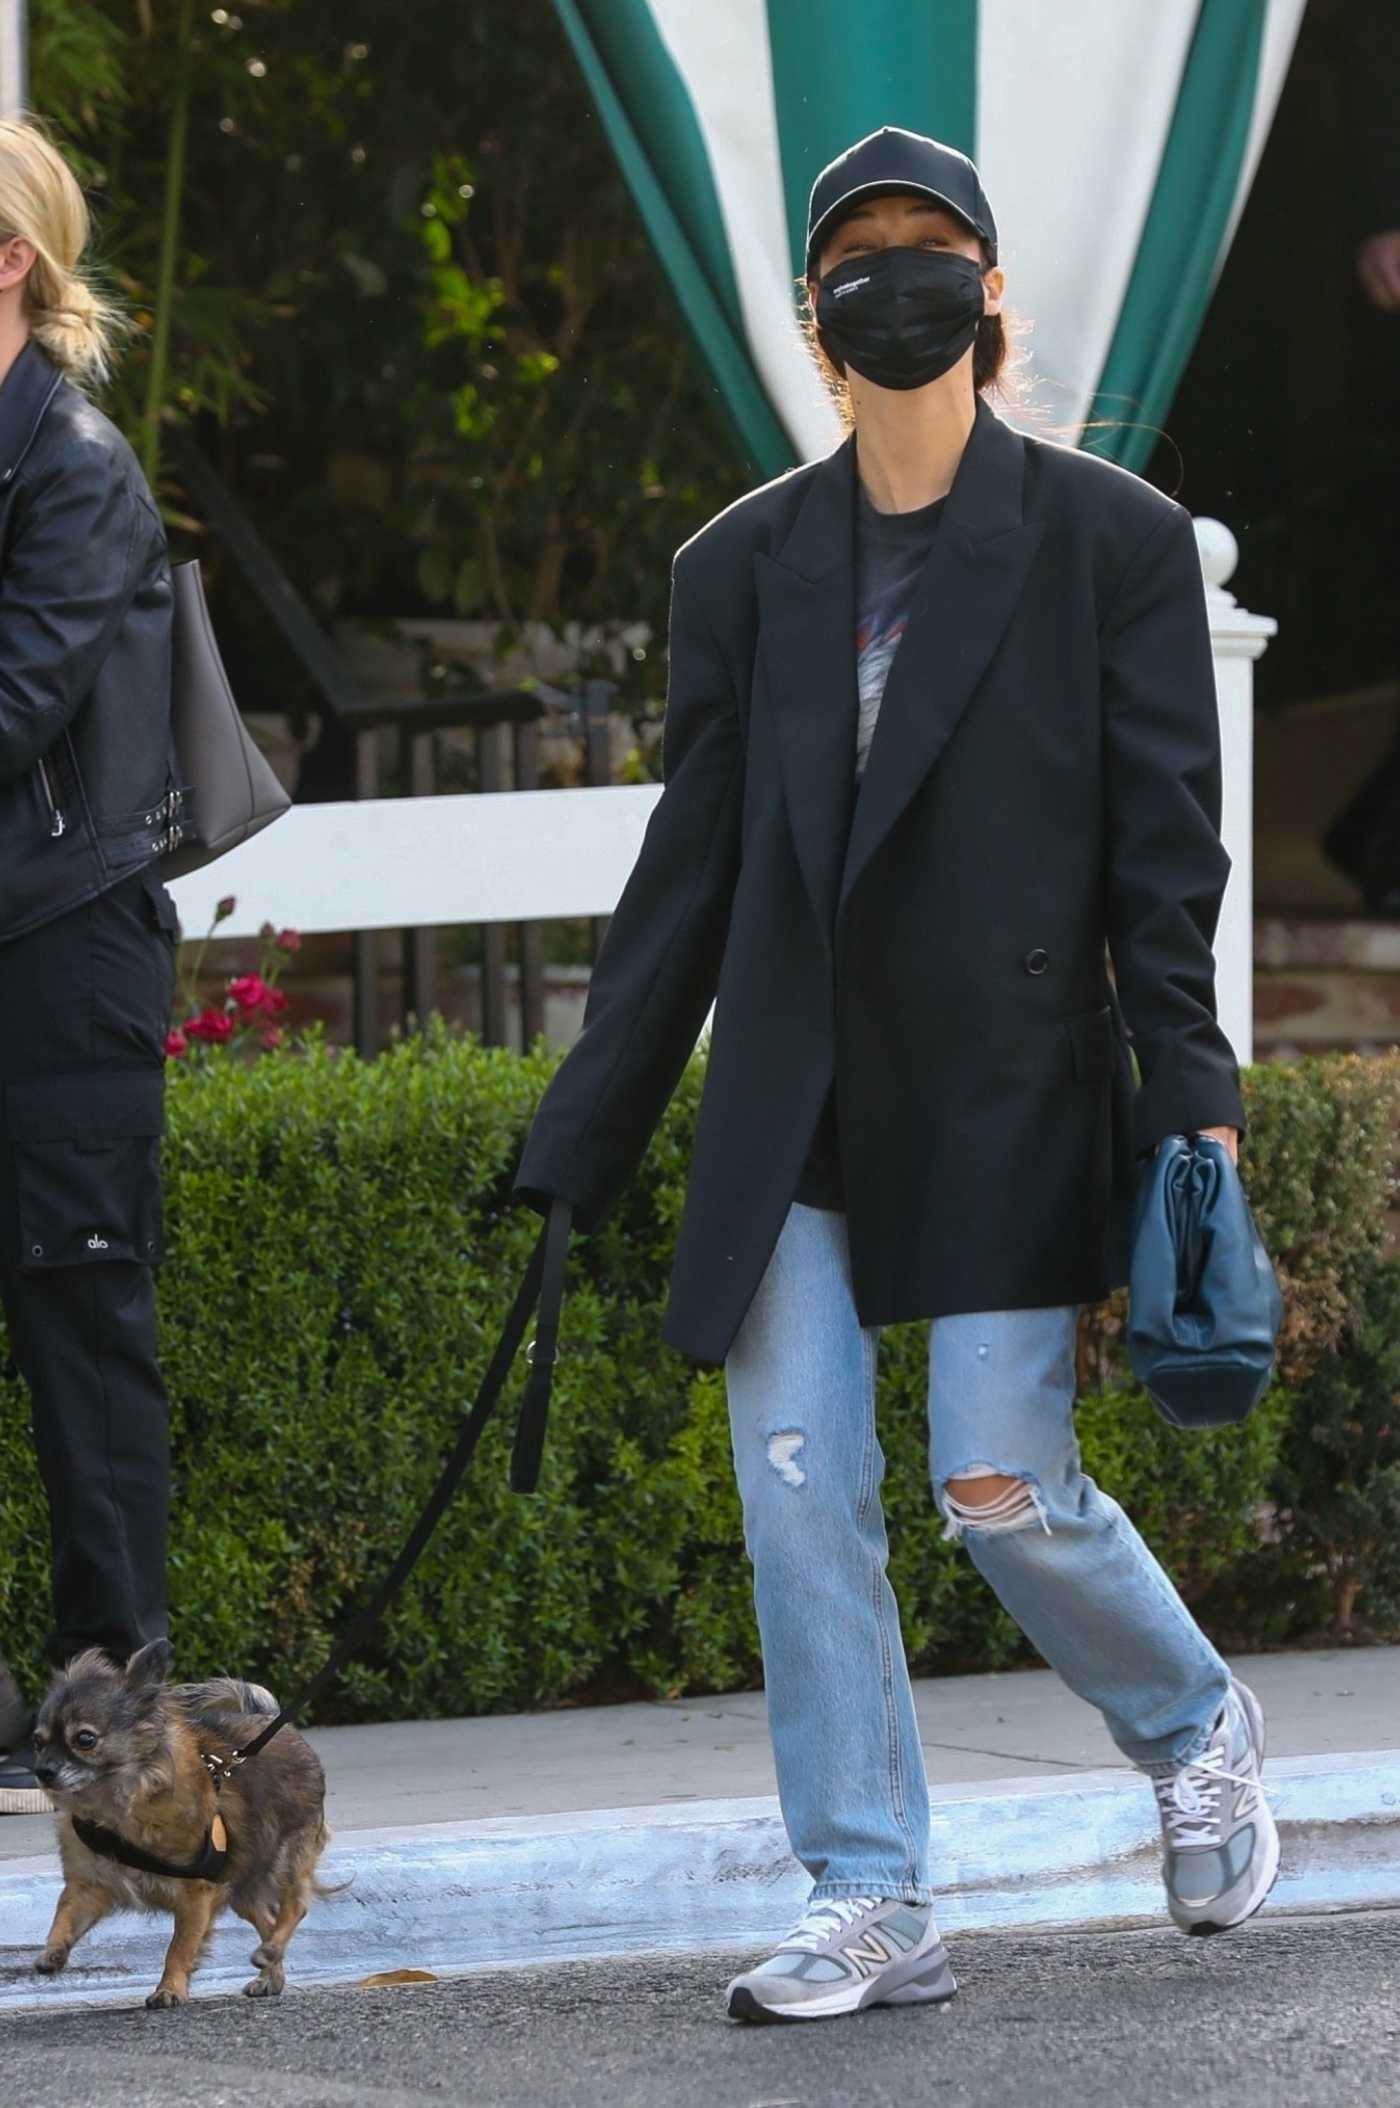 Cara Santana in a Black Blazer Walks Her Dog in West Hollywood 04/15/2021